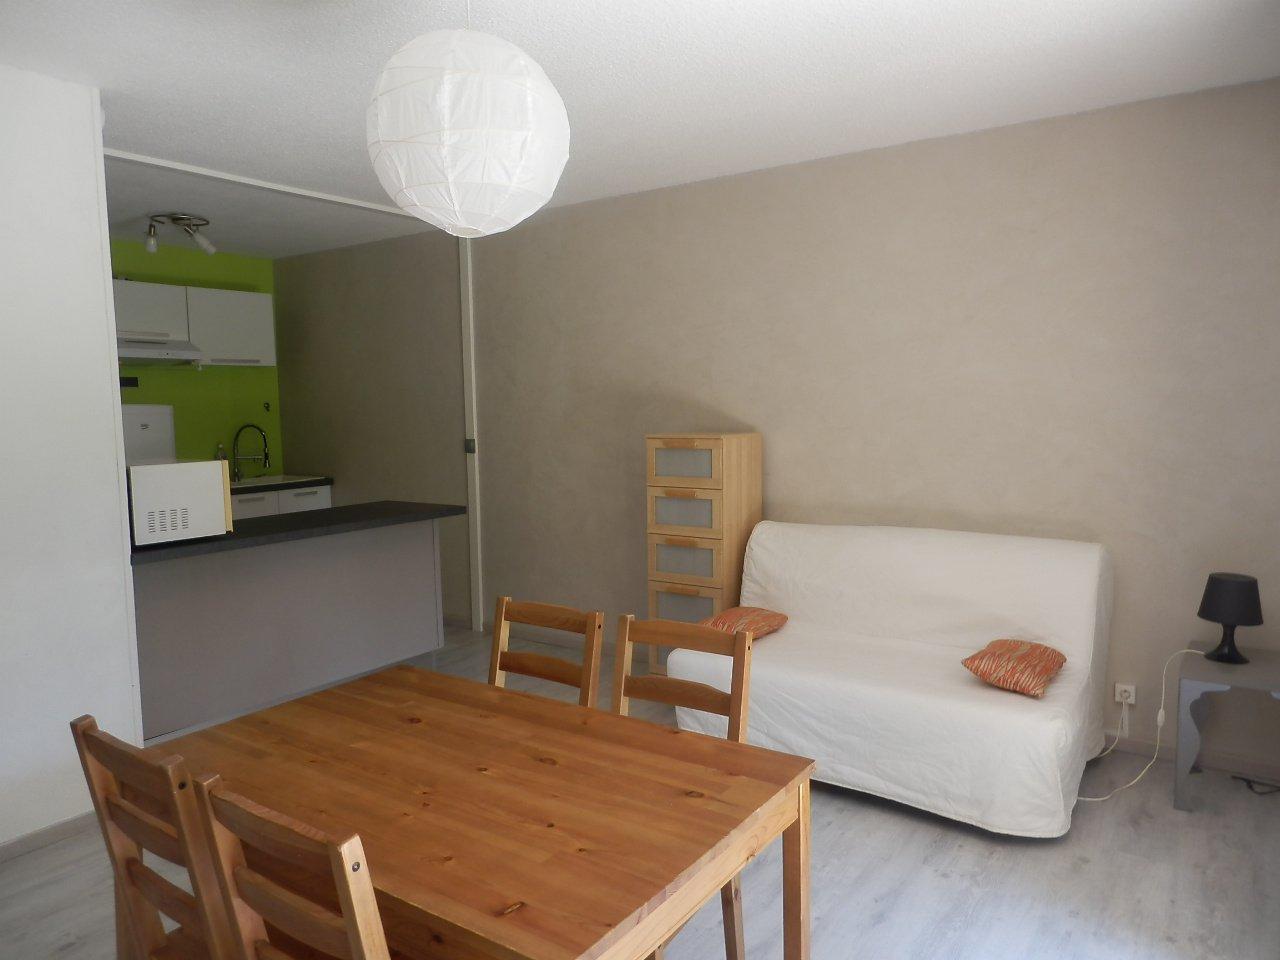 Studio meublé de 40m² avec jardin